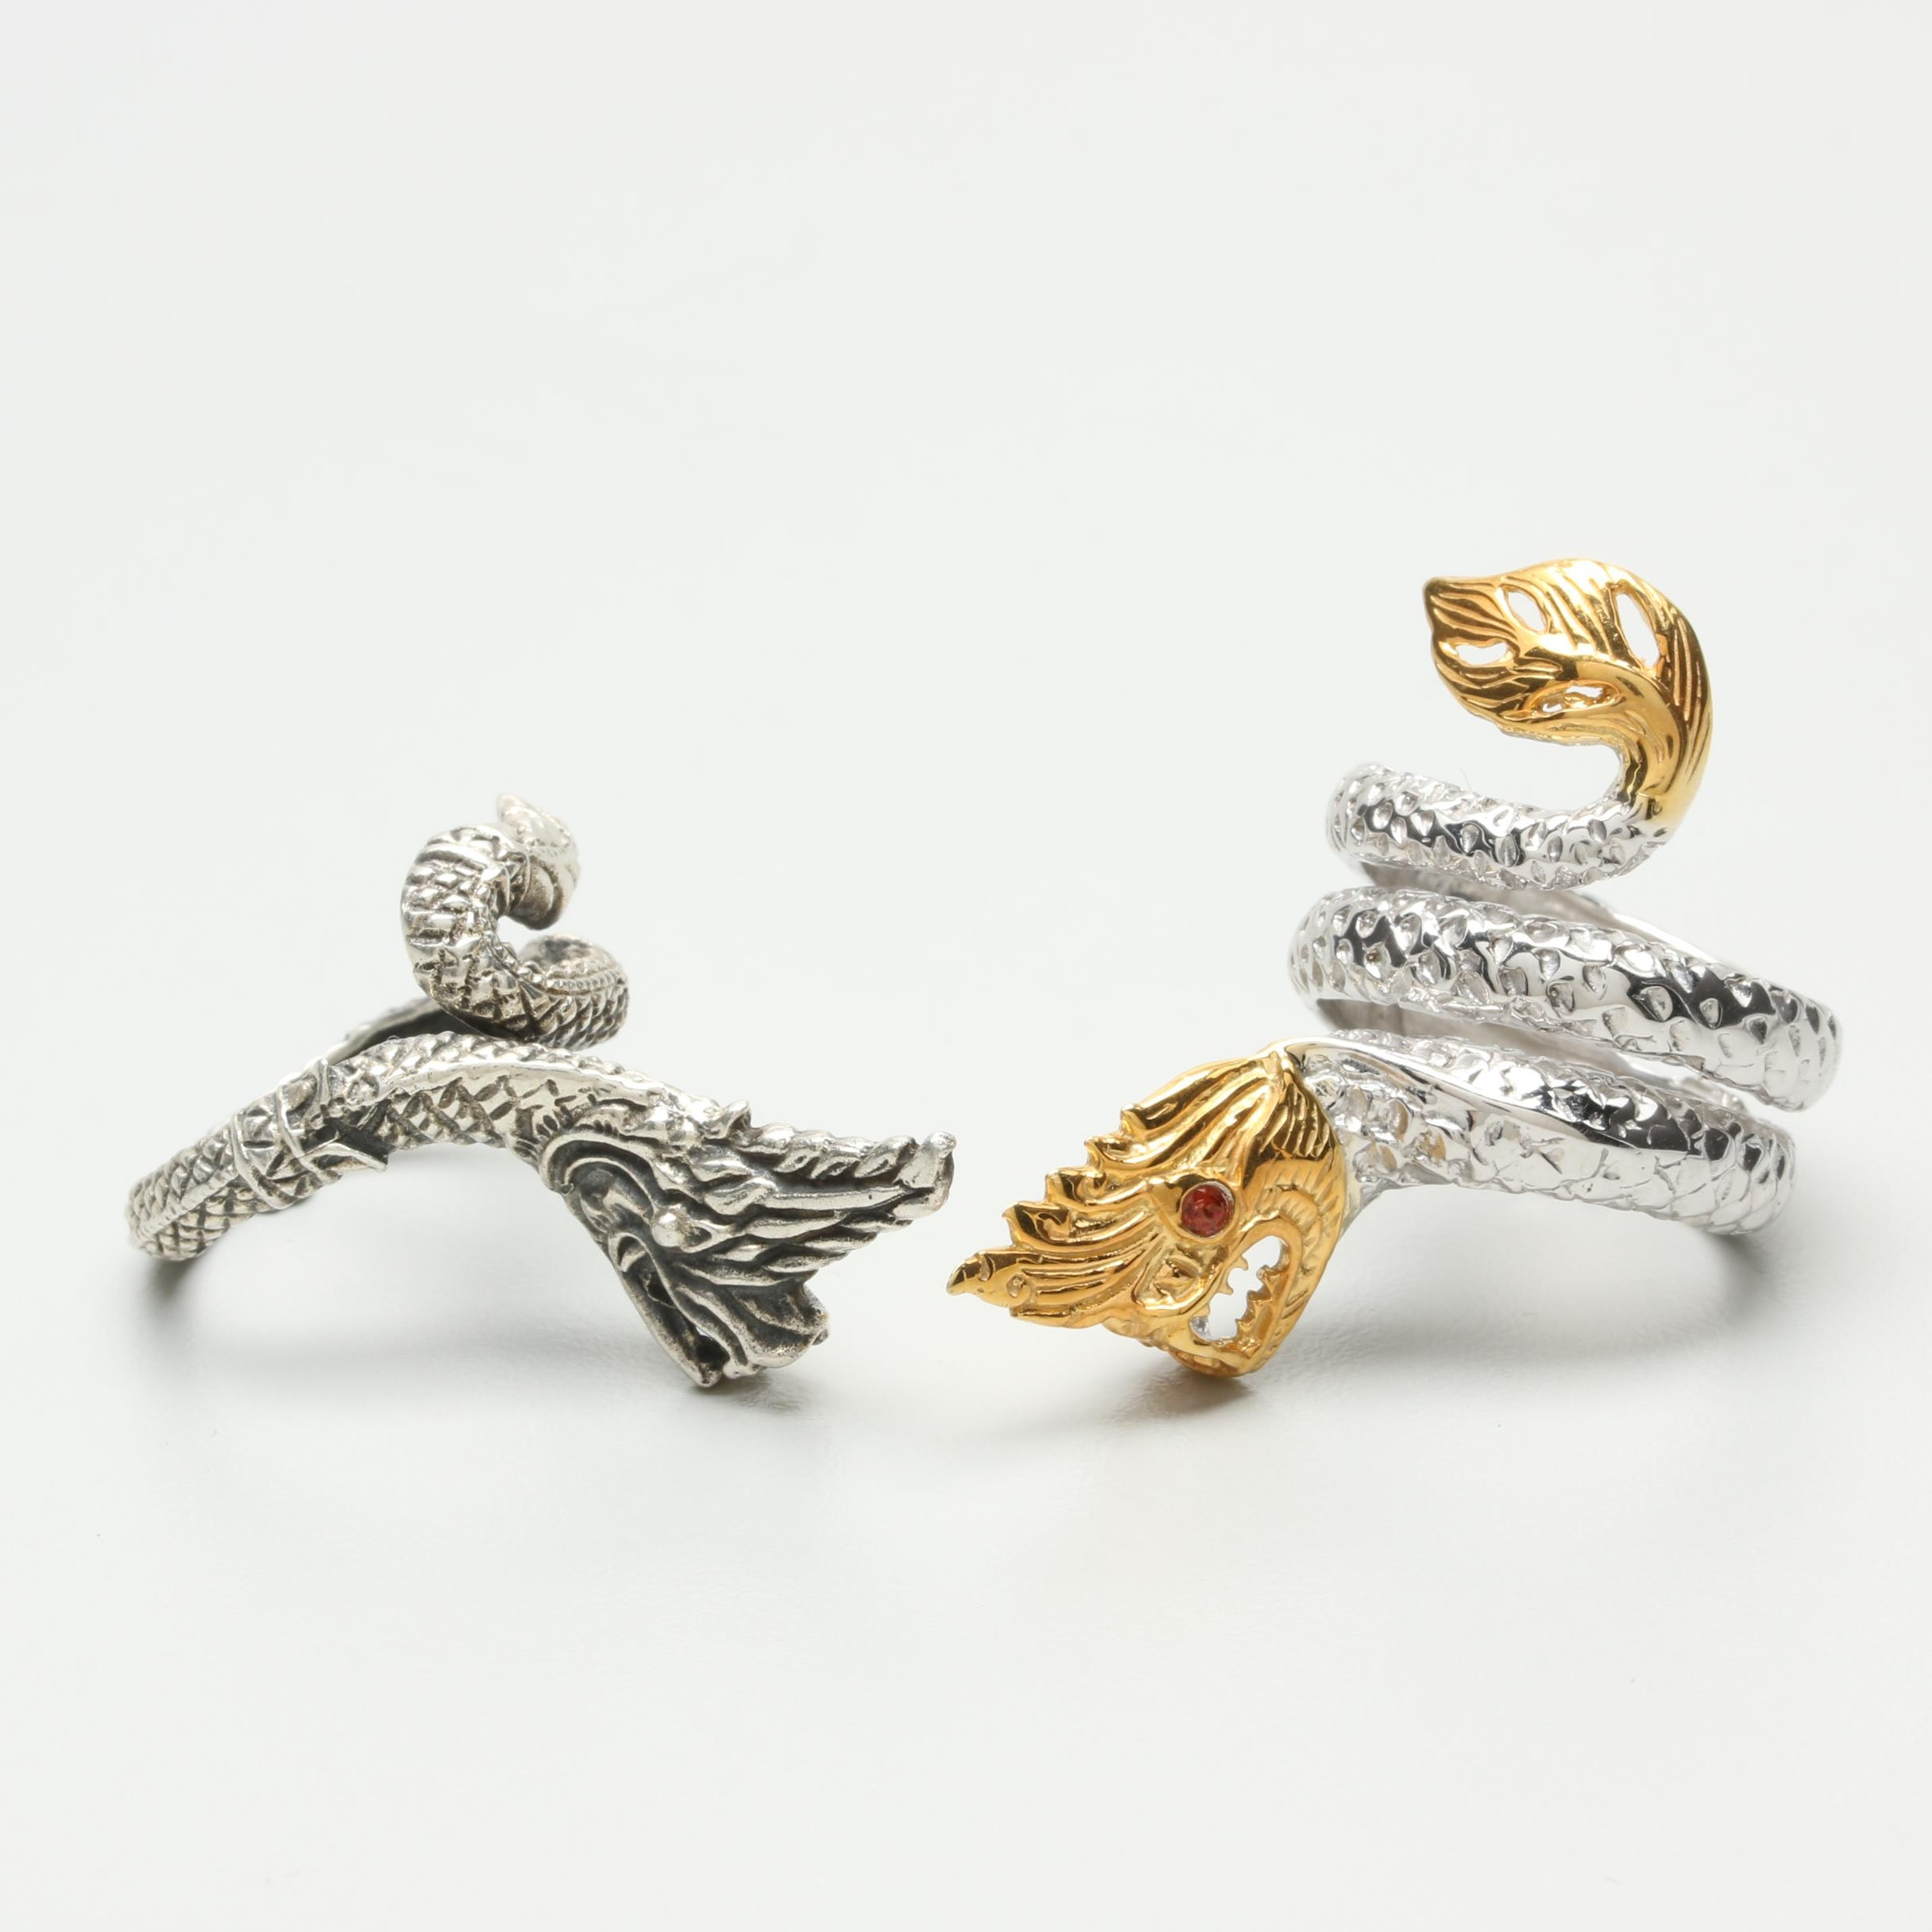 Sterling Silver Garnet Dragon Motif Rings